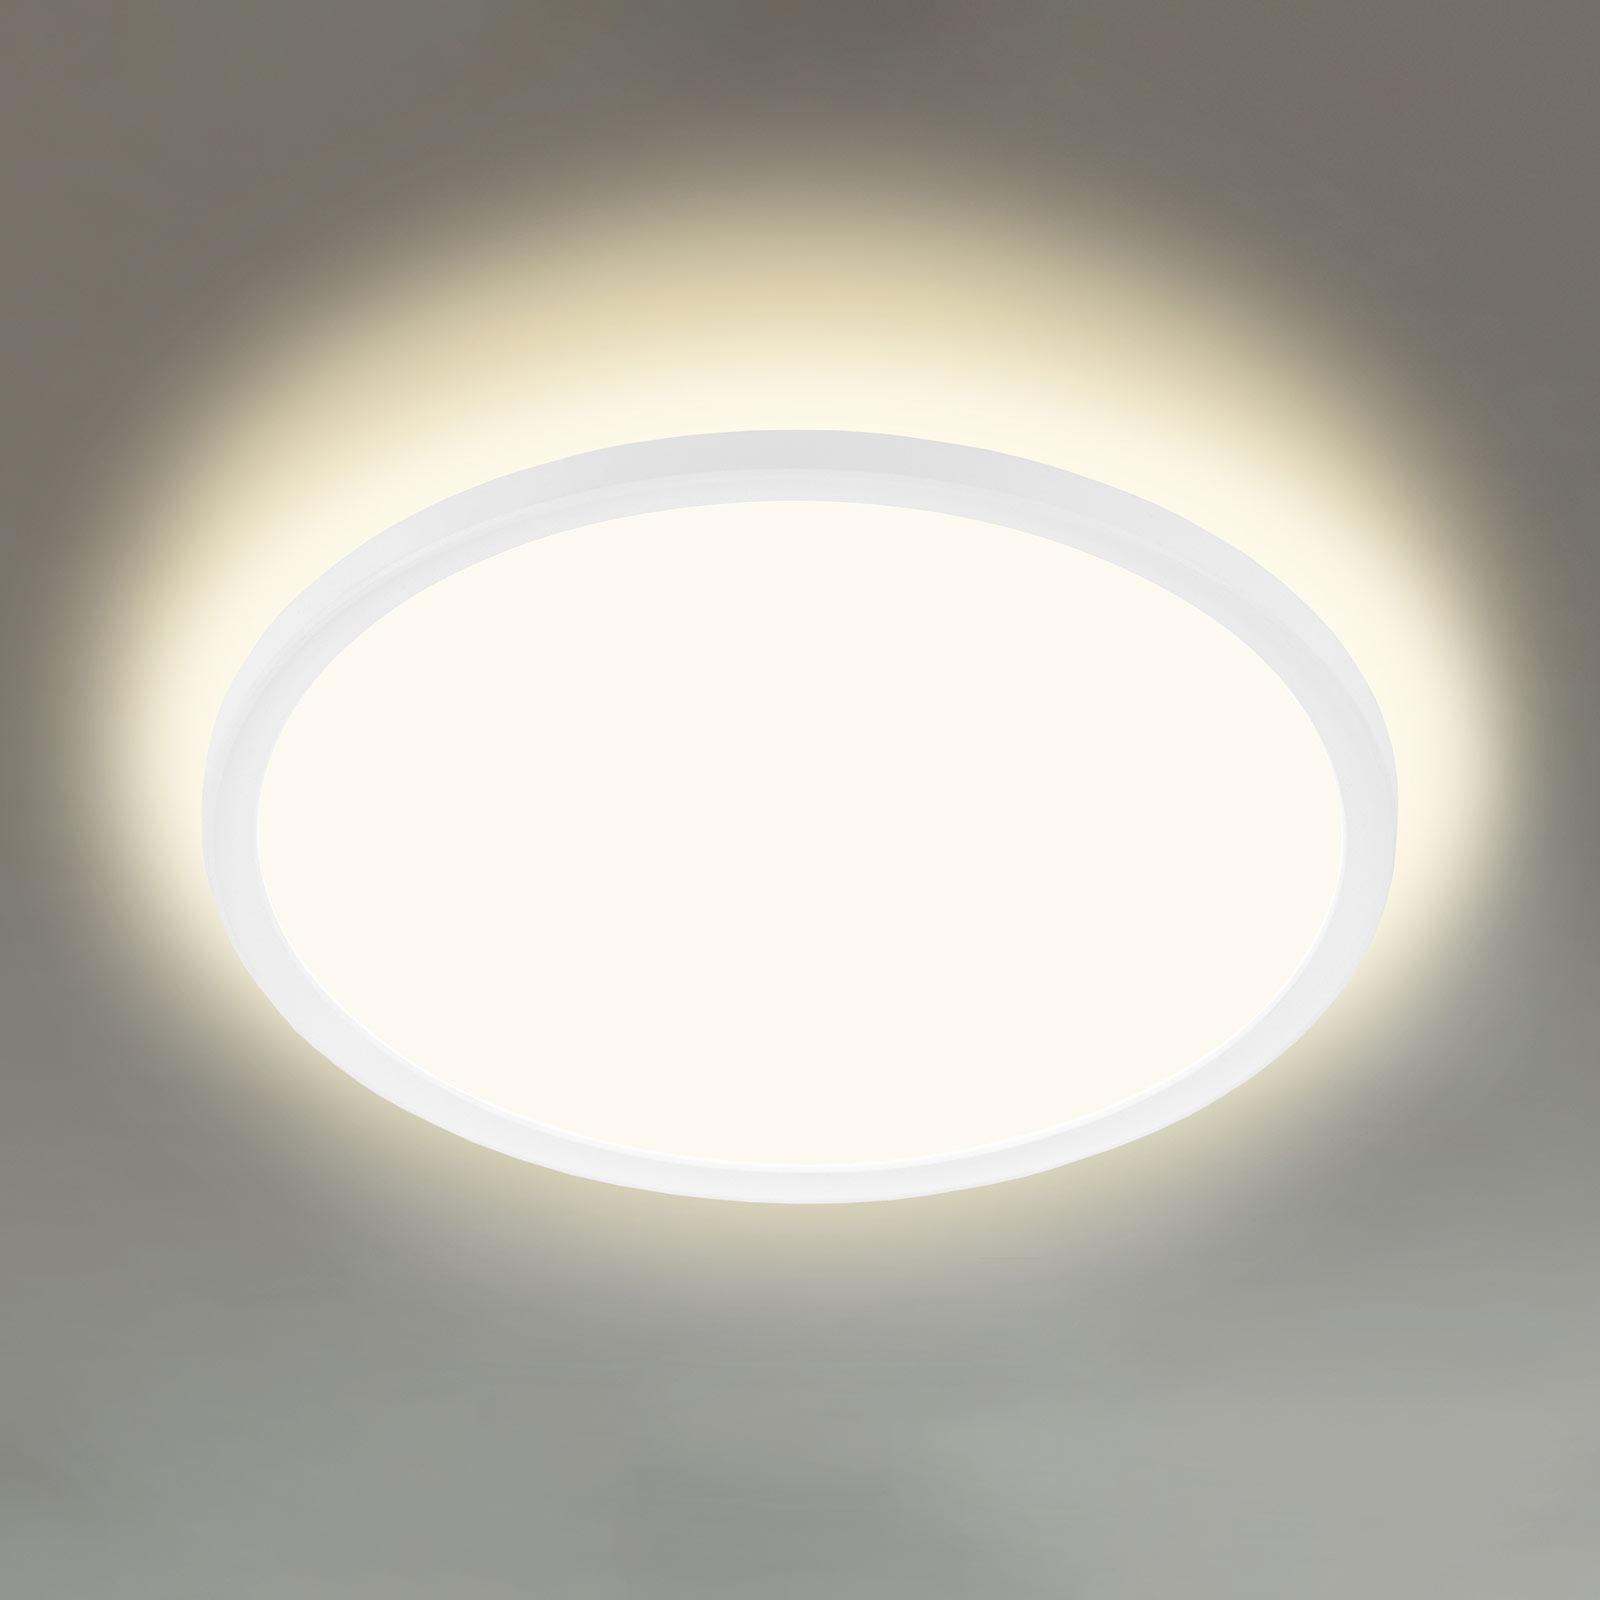 Lampa sufitowa LED 7155/7157, okrągła, 29,3cm